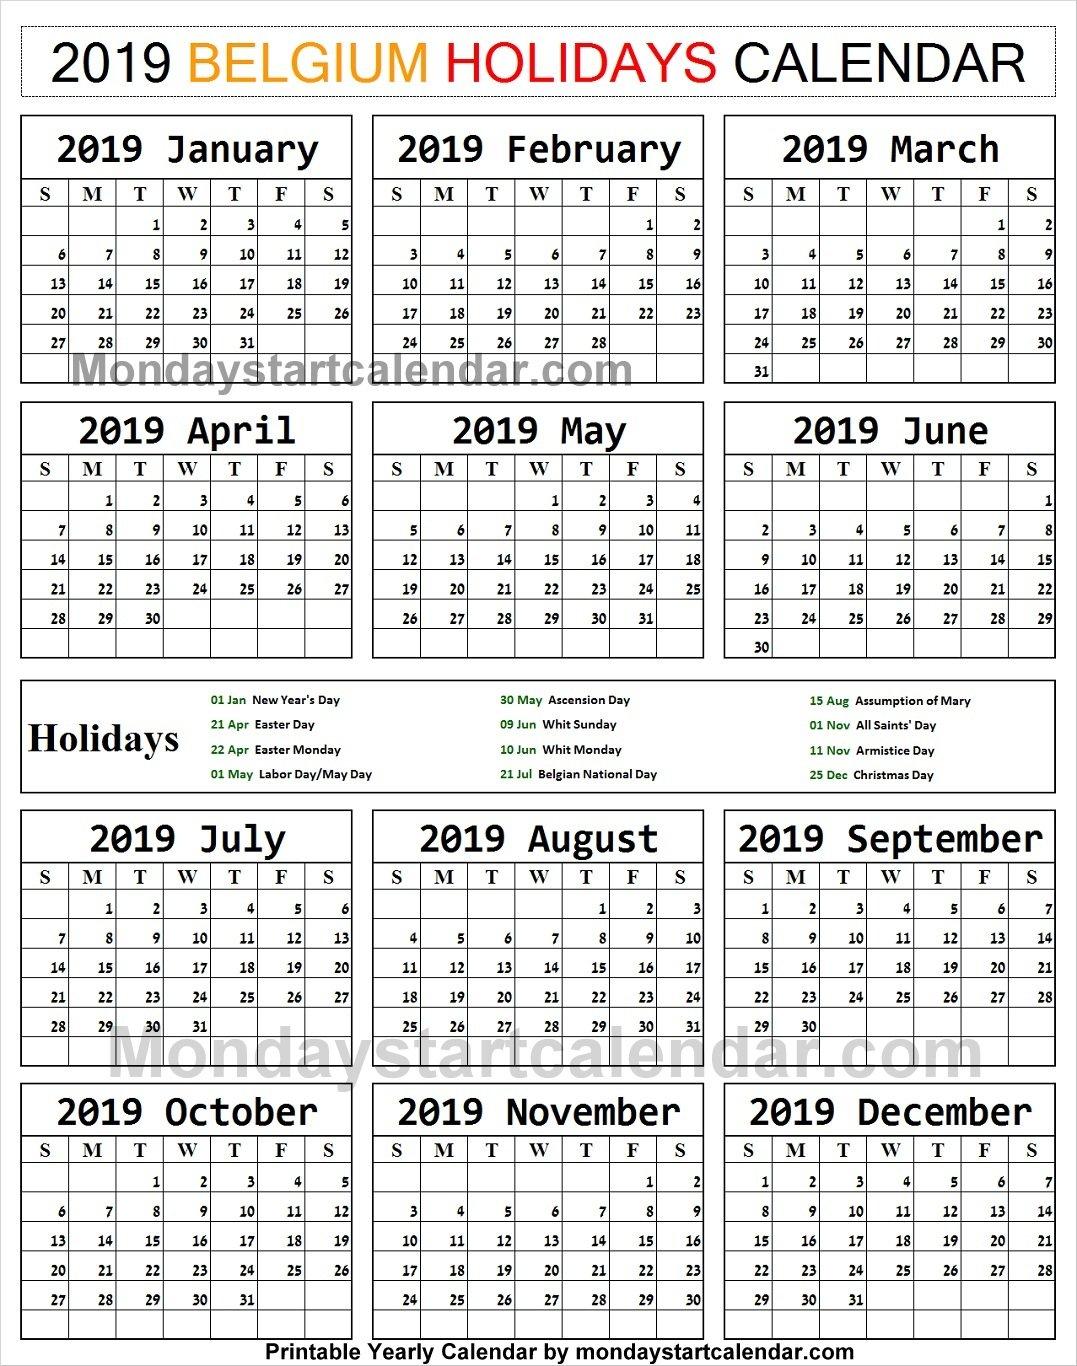 2019 Bank Holidays Belgium Calendar | 2019 Austria Calendar Templates Calendar 2019 Belgium